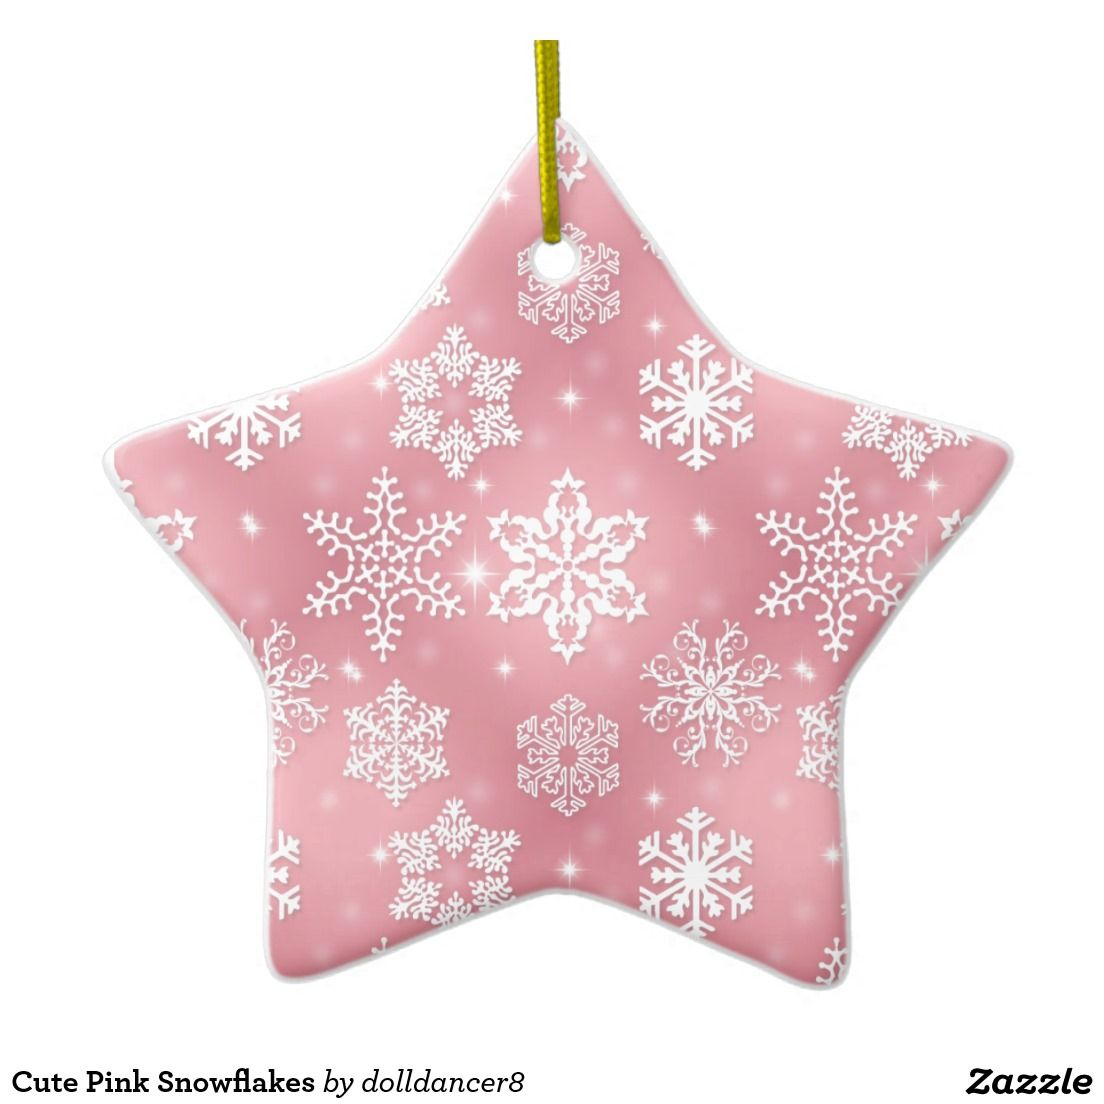 Cute Pink Snowflakes Ceramic Ornament   Zaz-press   Pinterest   Ornament